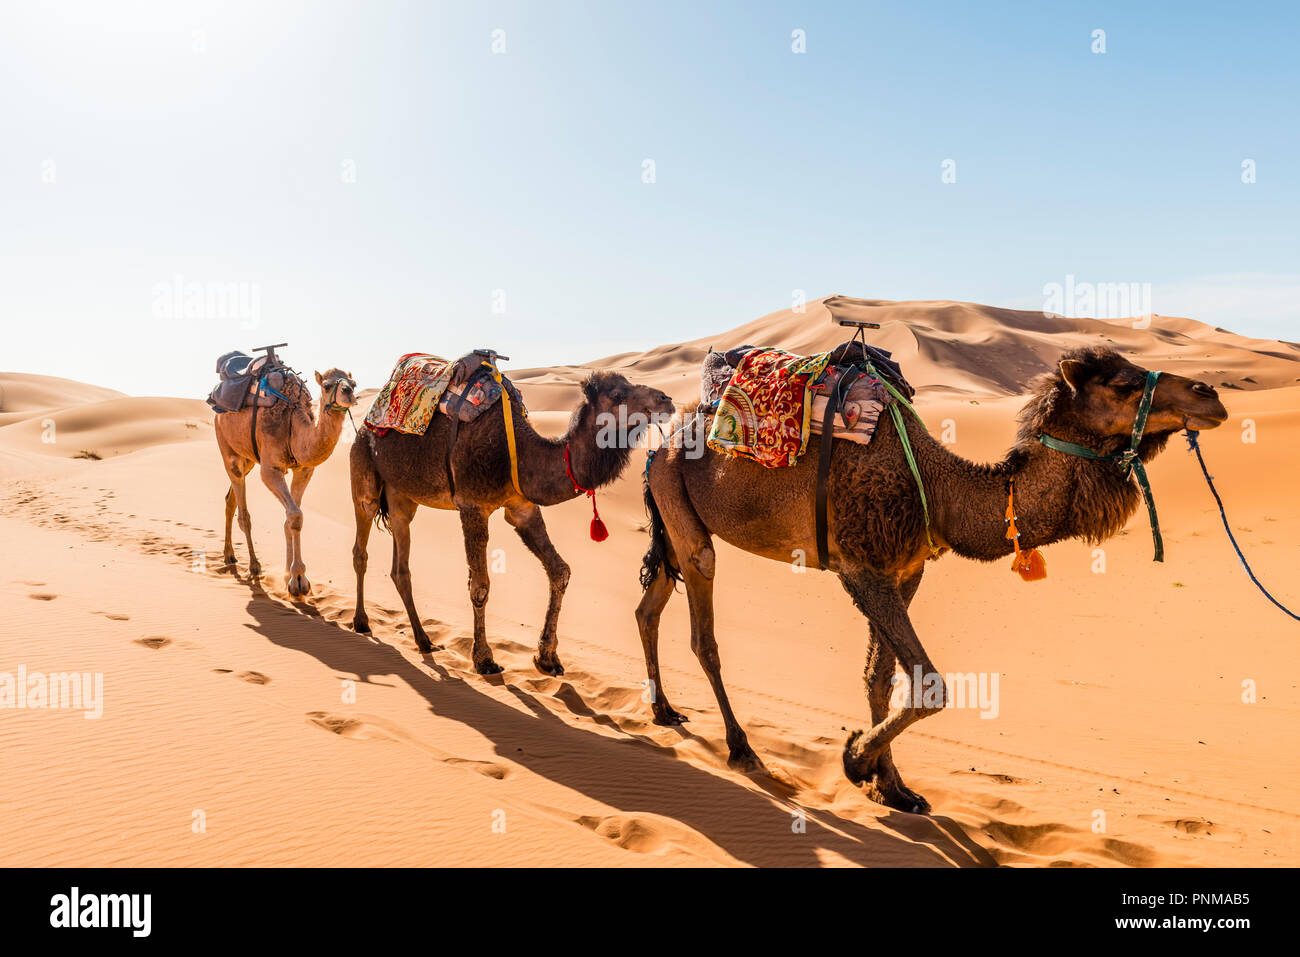 Three Dromedaries (Camelus dromedarius), caravan, run in sand dunes in the desert, Erg Chebbi, Merzouga, Sahara, Morocco - Stock Image